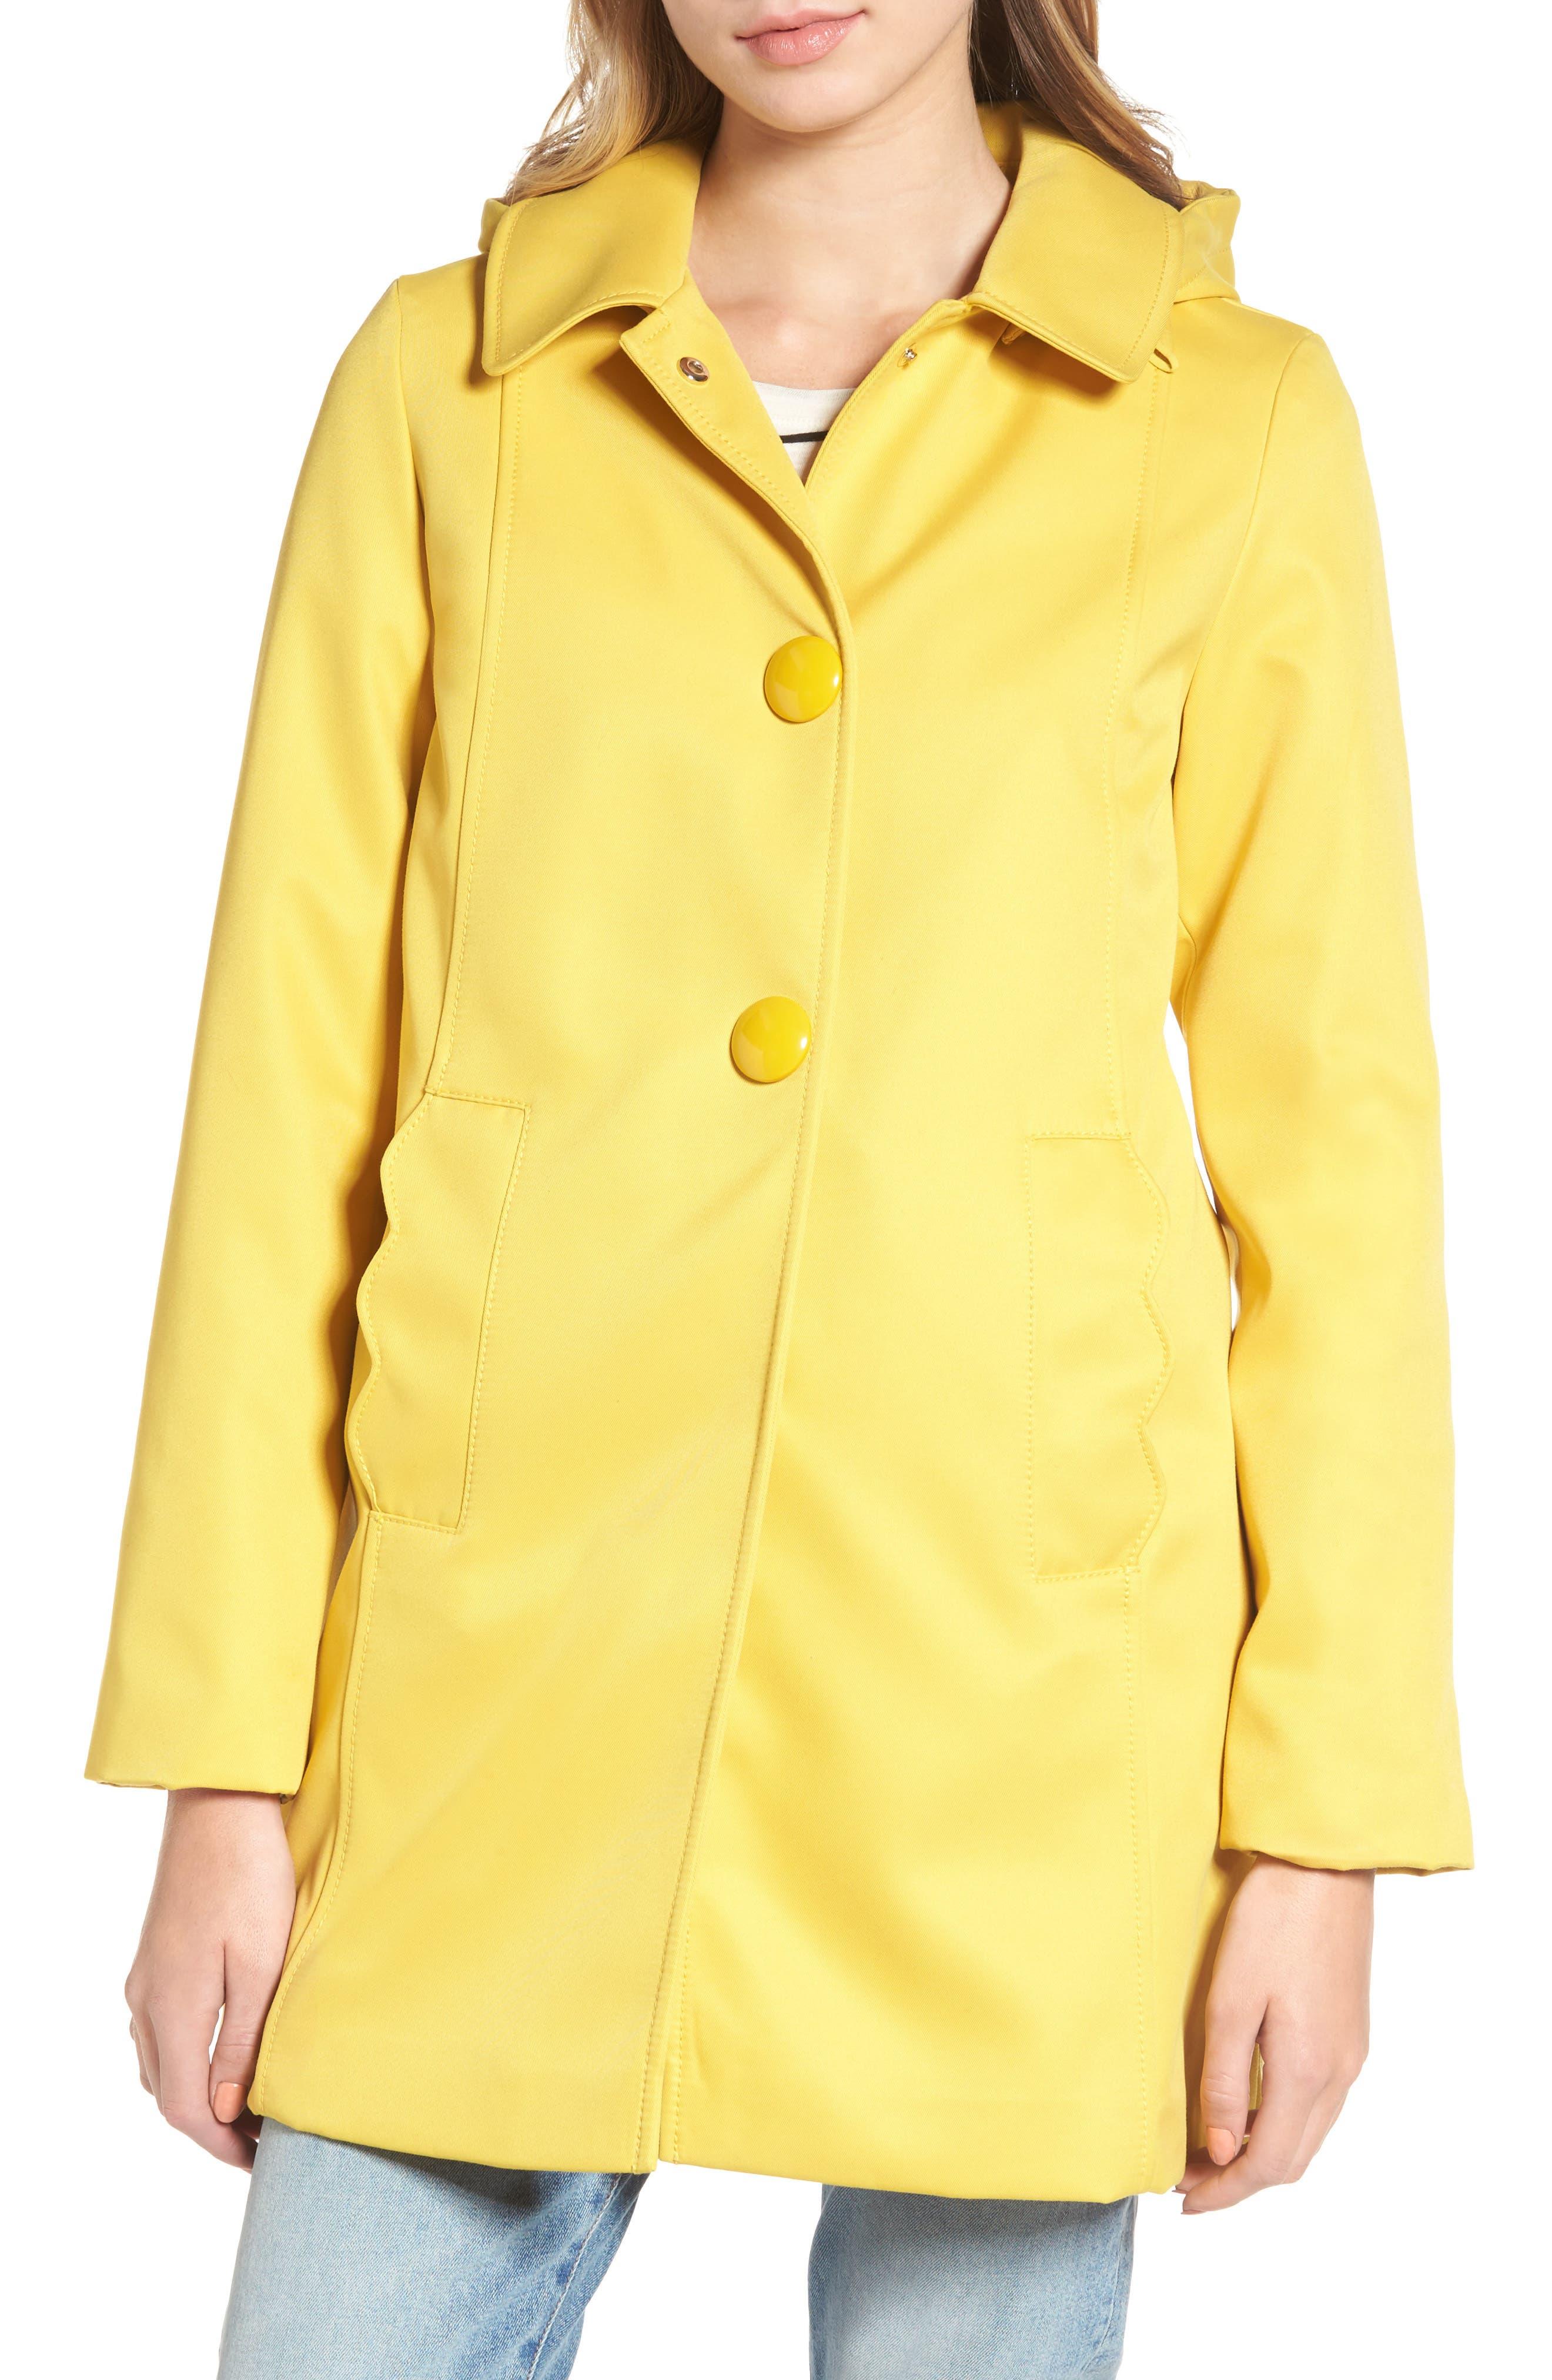 KATE SPADE NEW YORK scallop edge raincoat